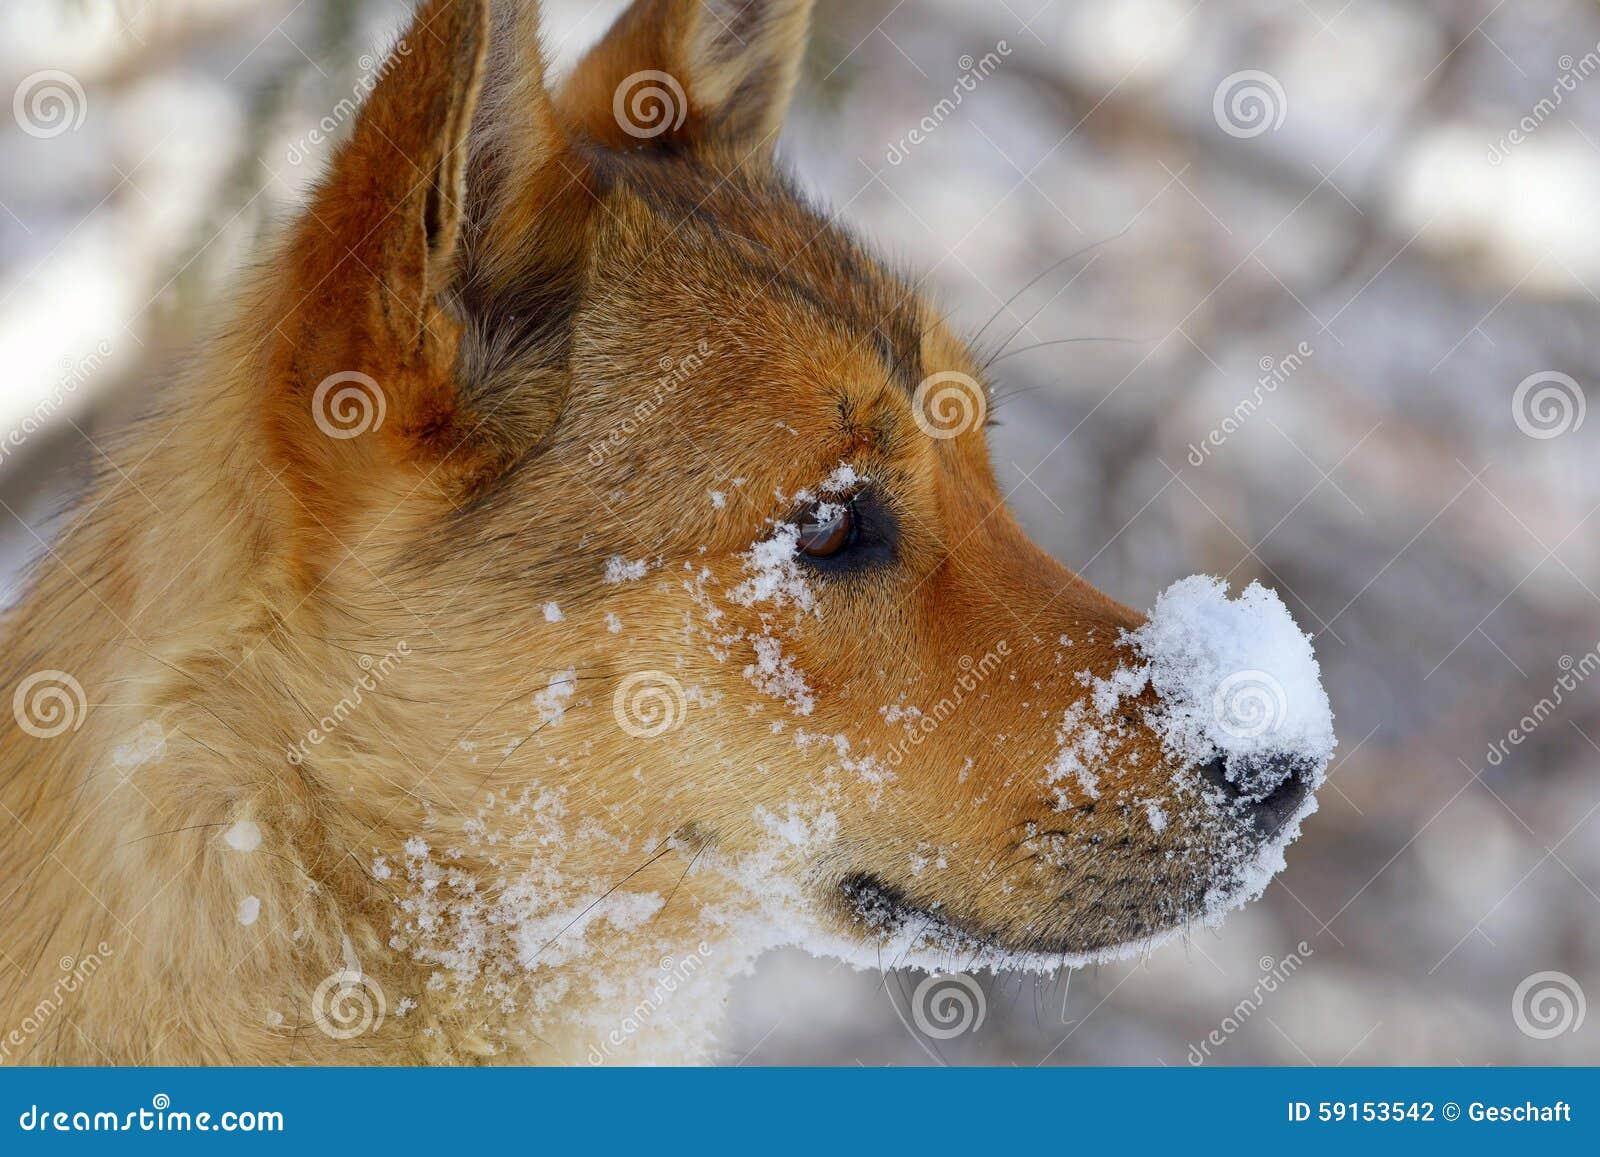 winter nose dog